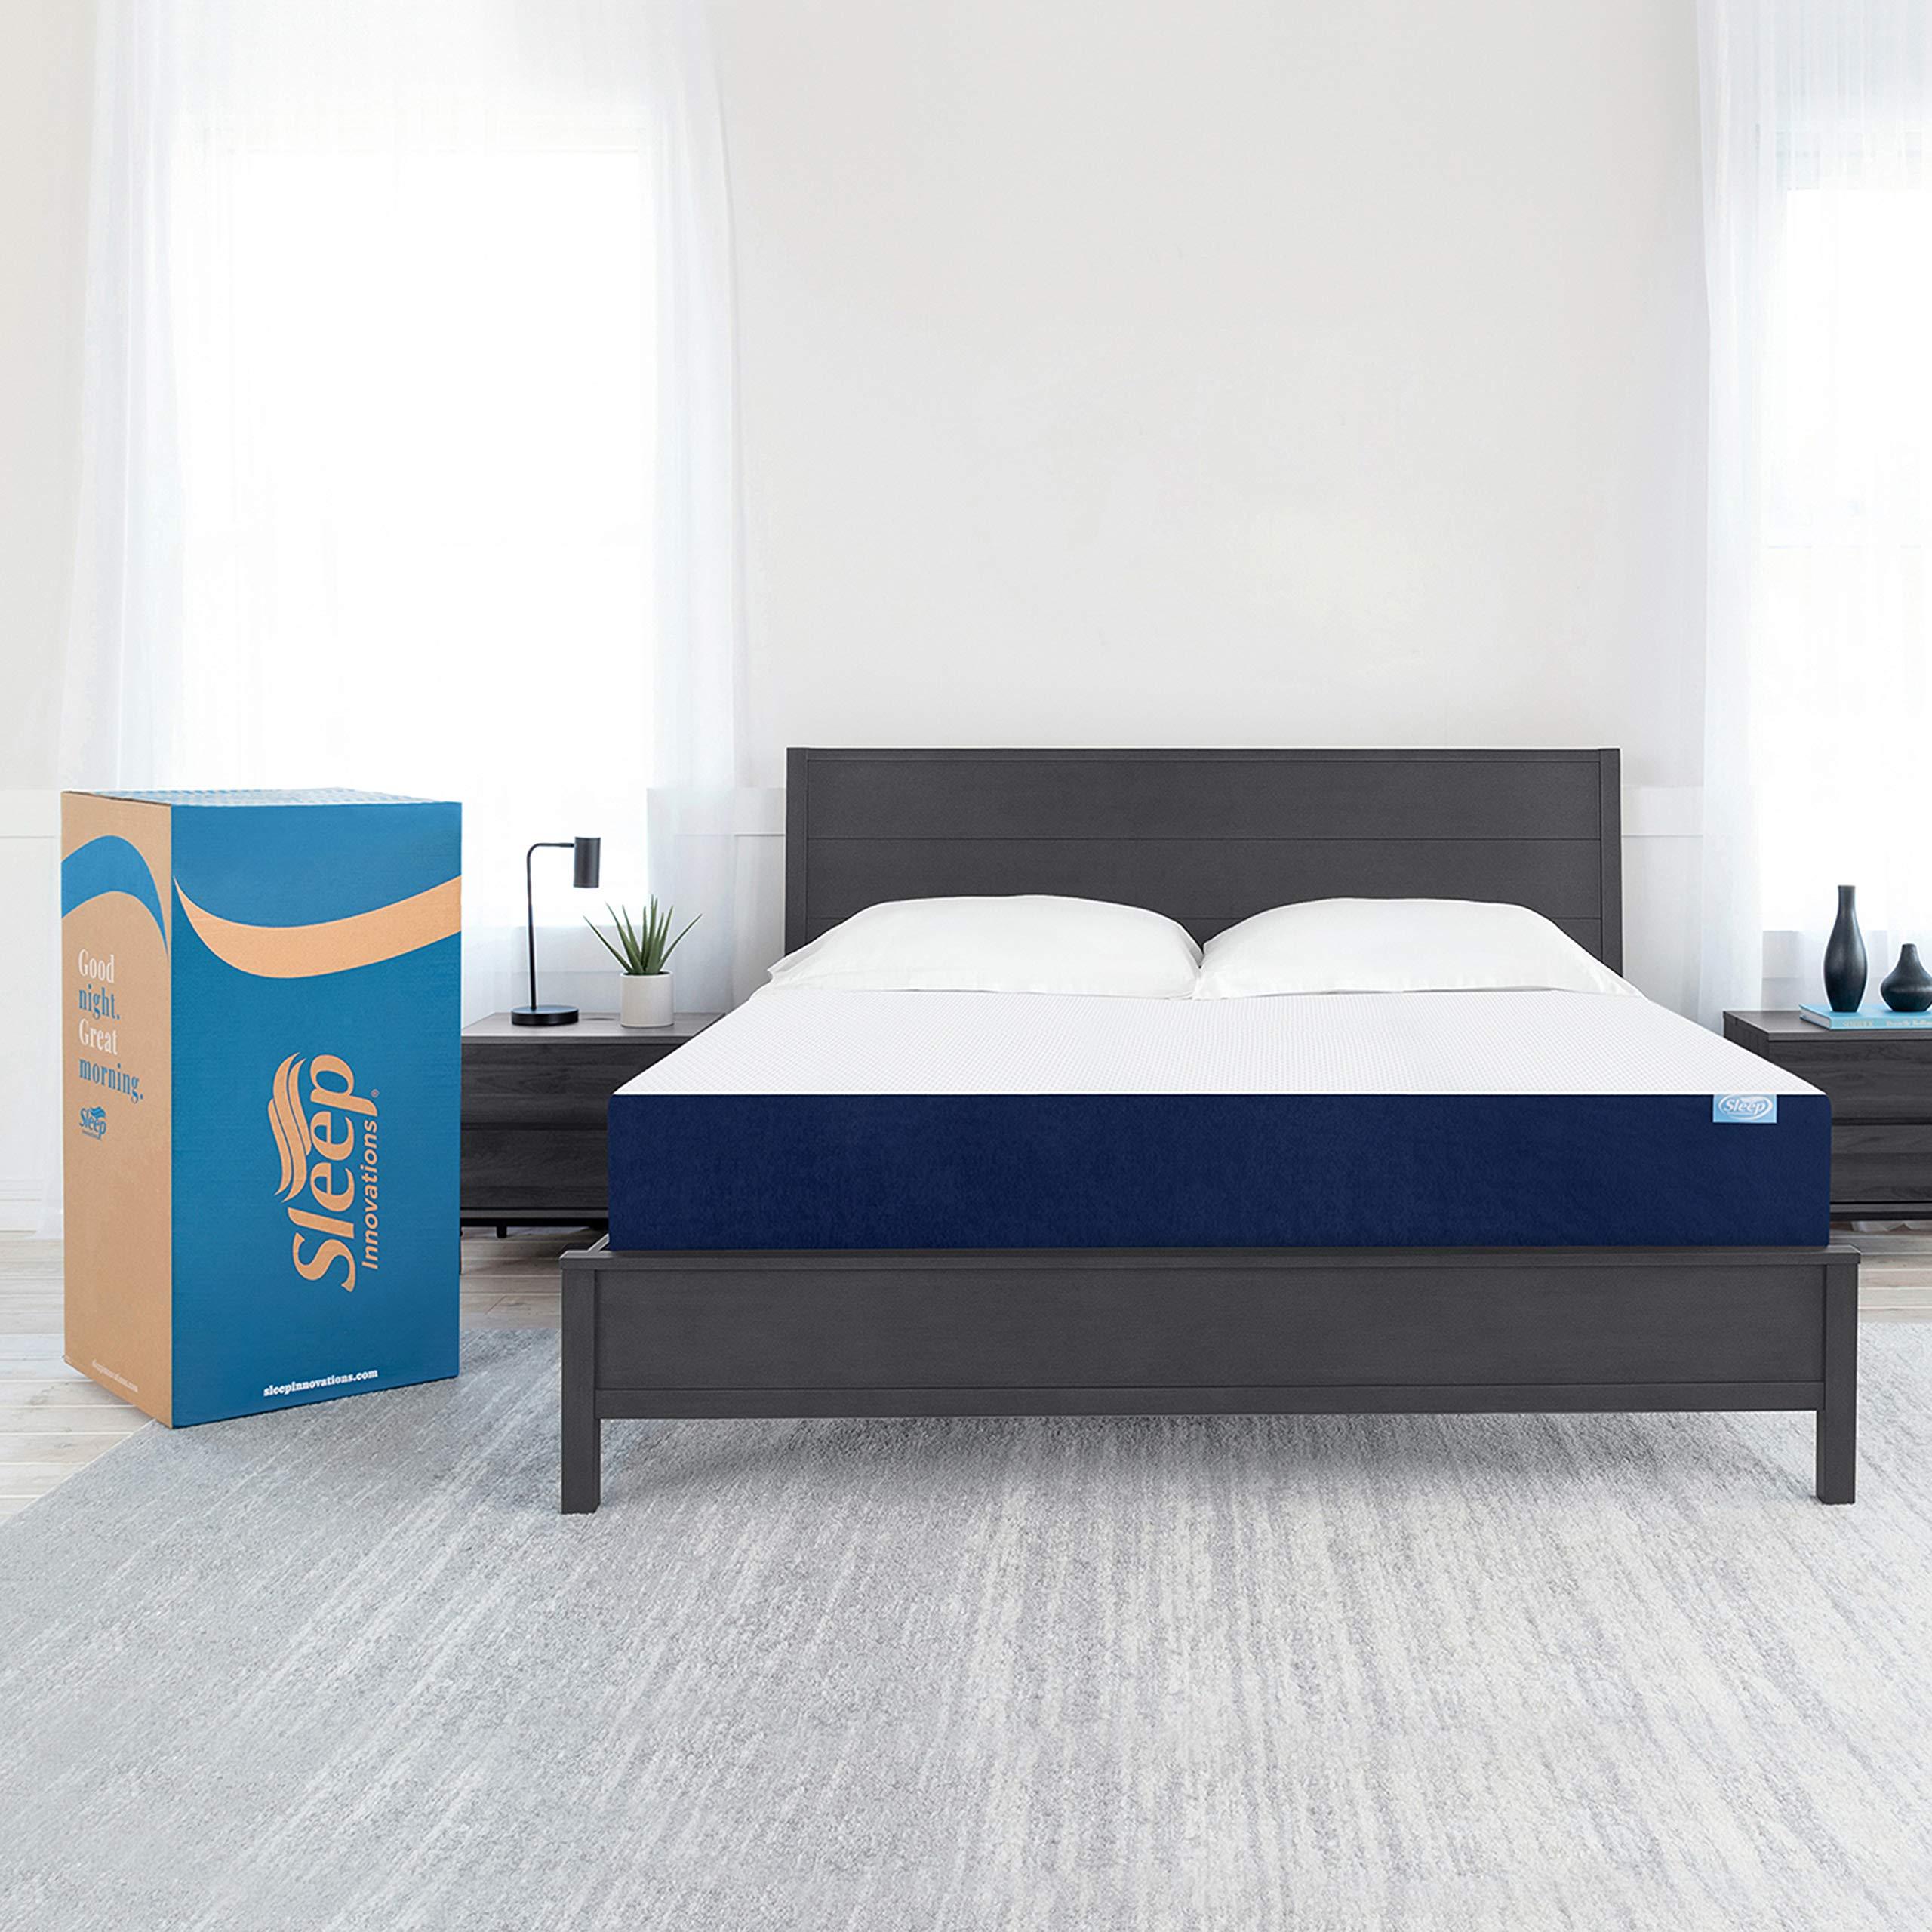 Sleep Innovations Marley 10-inch Memory Foam Mattress, Cal King, White